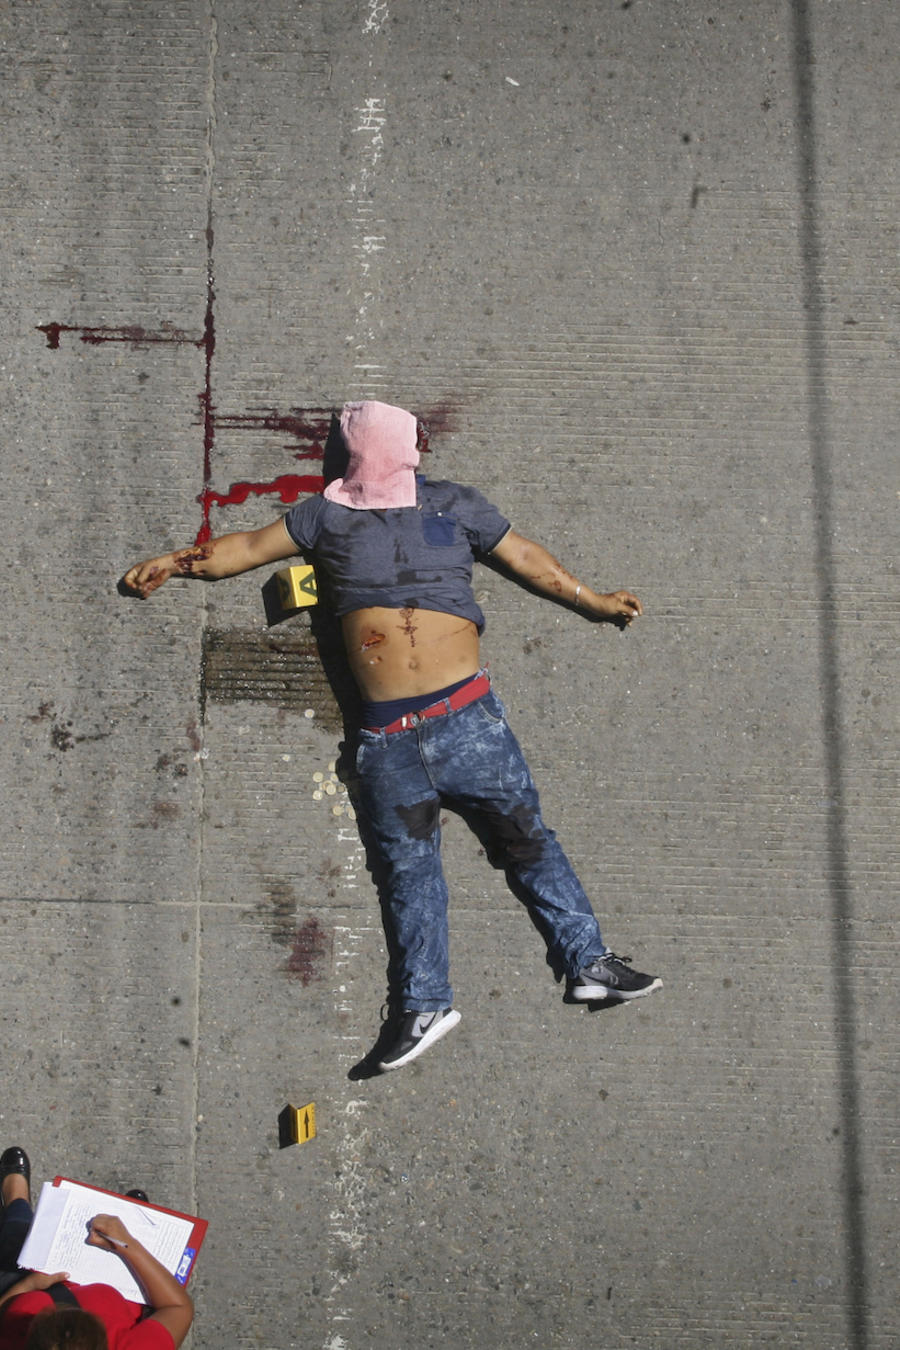 Investigadores federales analizan un cadáver tiroteado a plena luz del día en Acapulco en agosto de 2017.